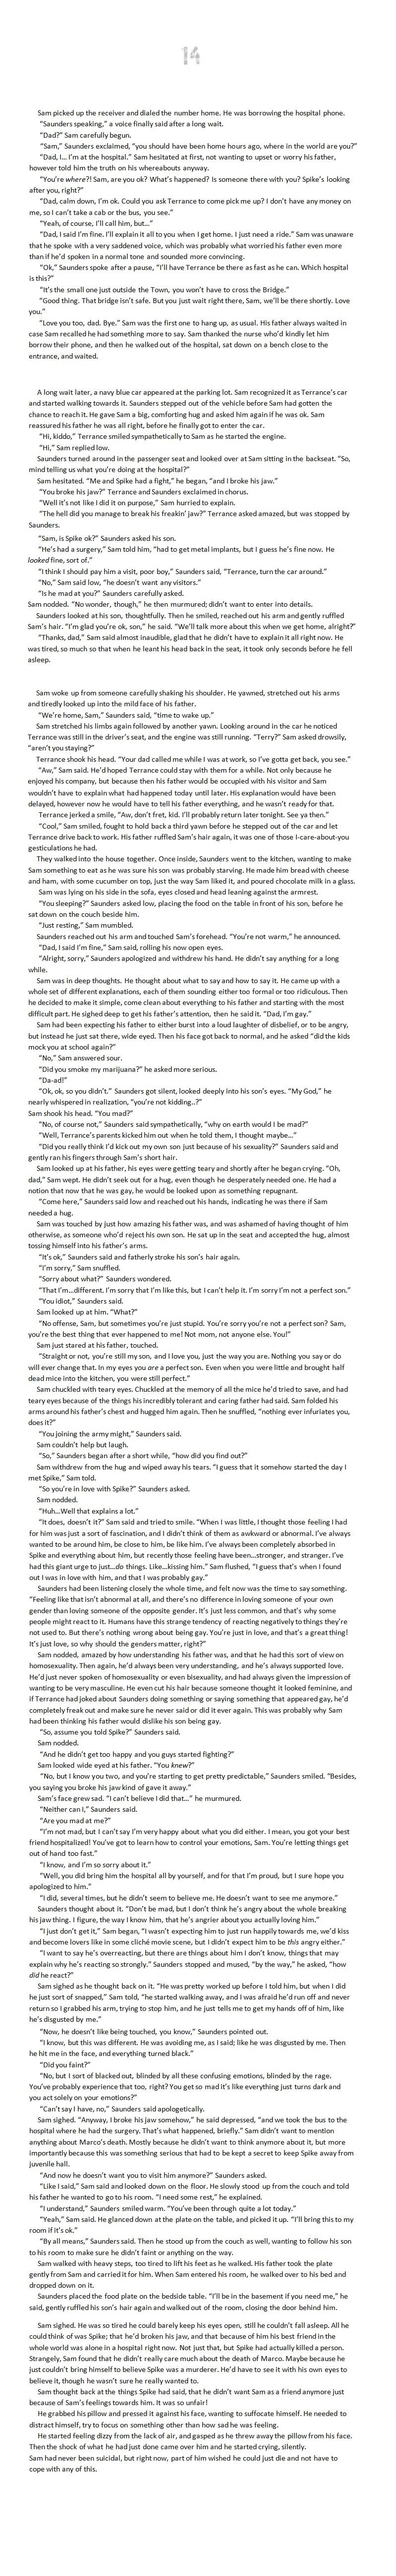 SPIKE - chapter 14 by oomizuao